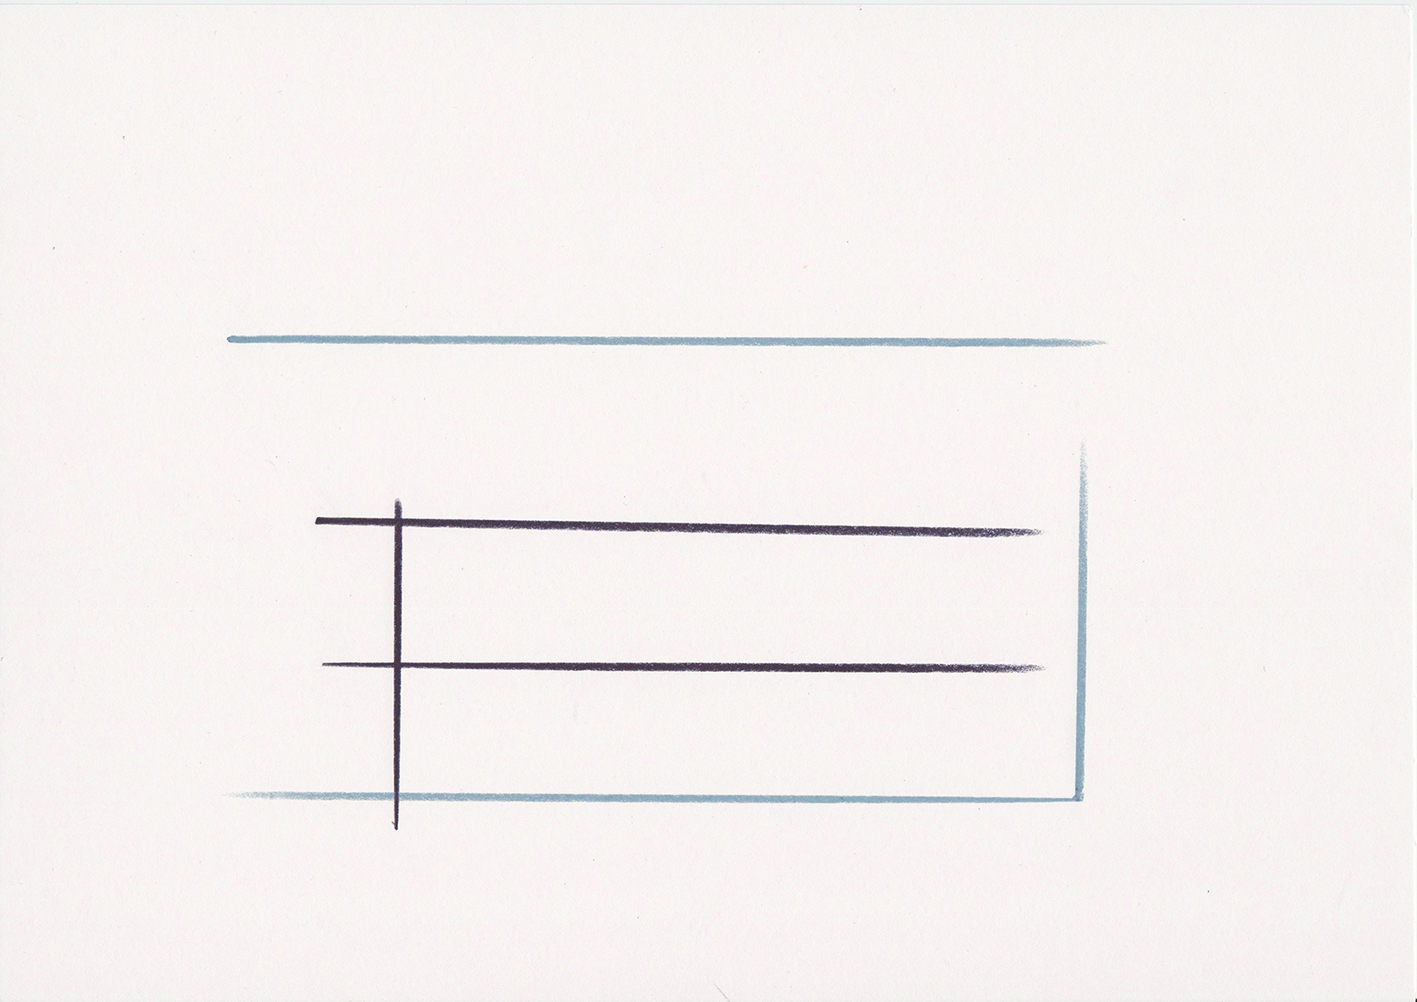 stitt 'Harmony Heights Xl' pencil on paper, 21x30cm 2016